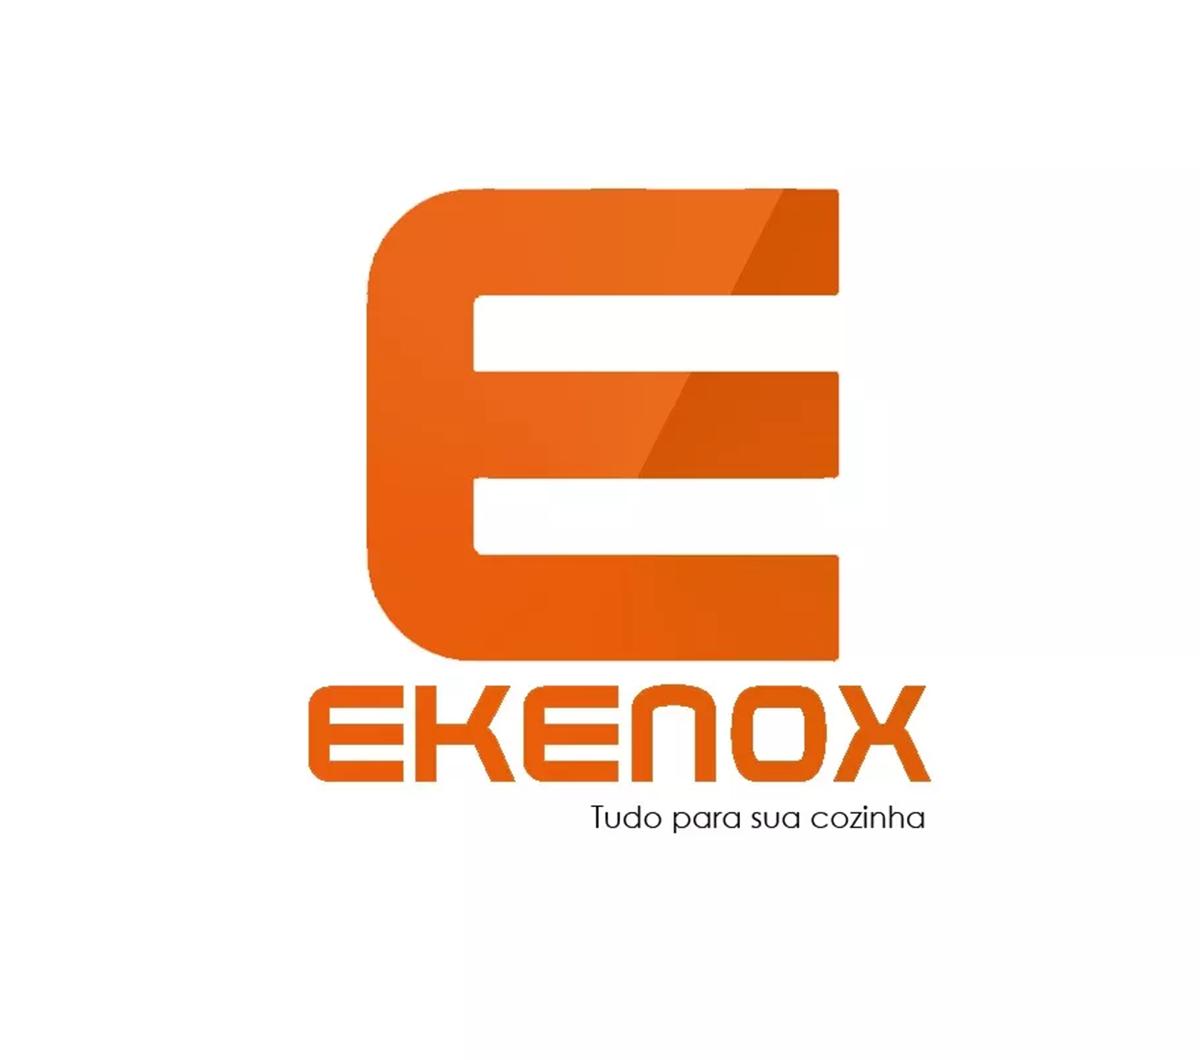 Kit 20 Assadeiras Para Pão Frances 5 Tiras 58x70 Em Aluminio Ekenox  - EKENOX- Equipamentos Industriais